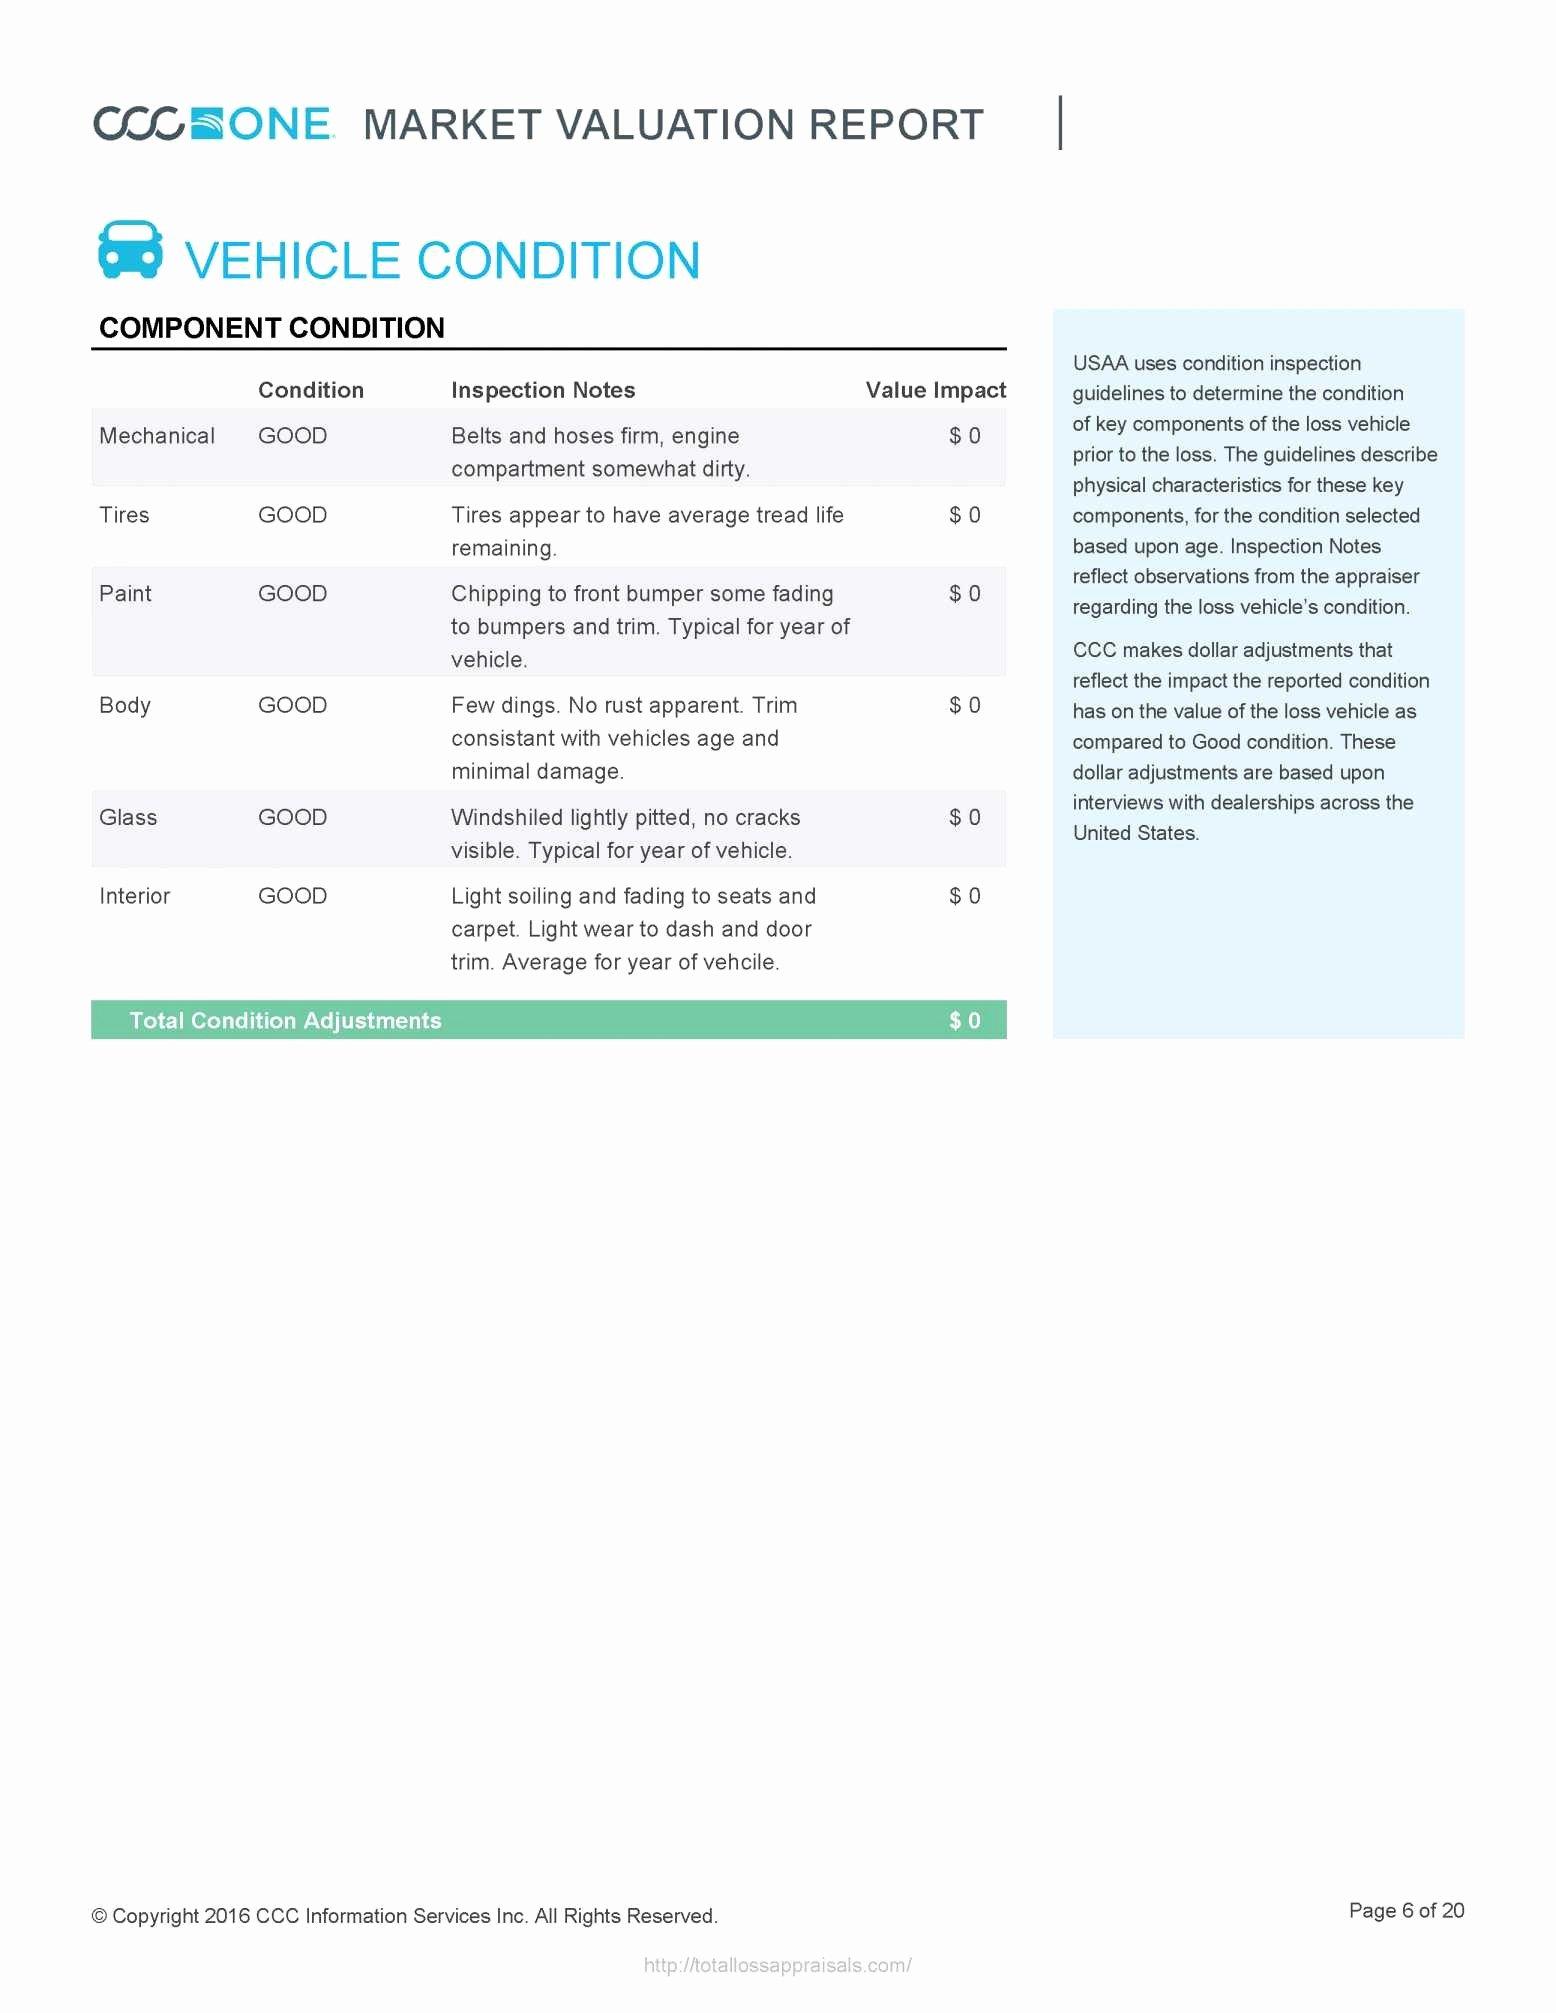 Business Valuation Report Template Worksheet – Amandae Along With Business Valuation Report Template Worksheet